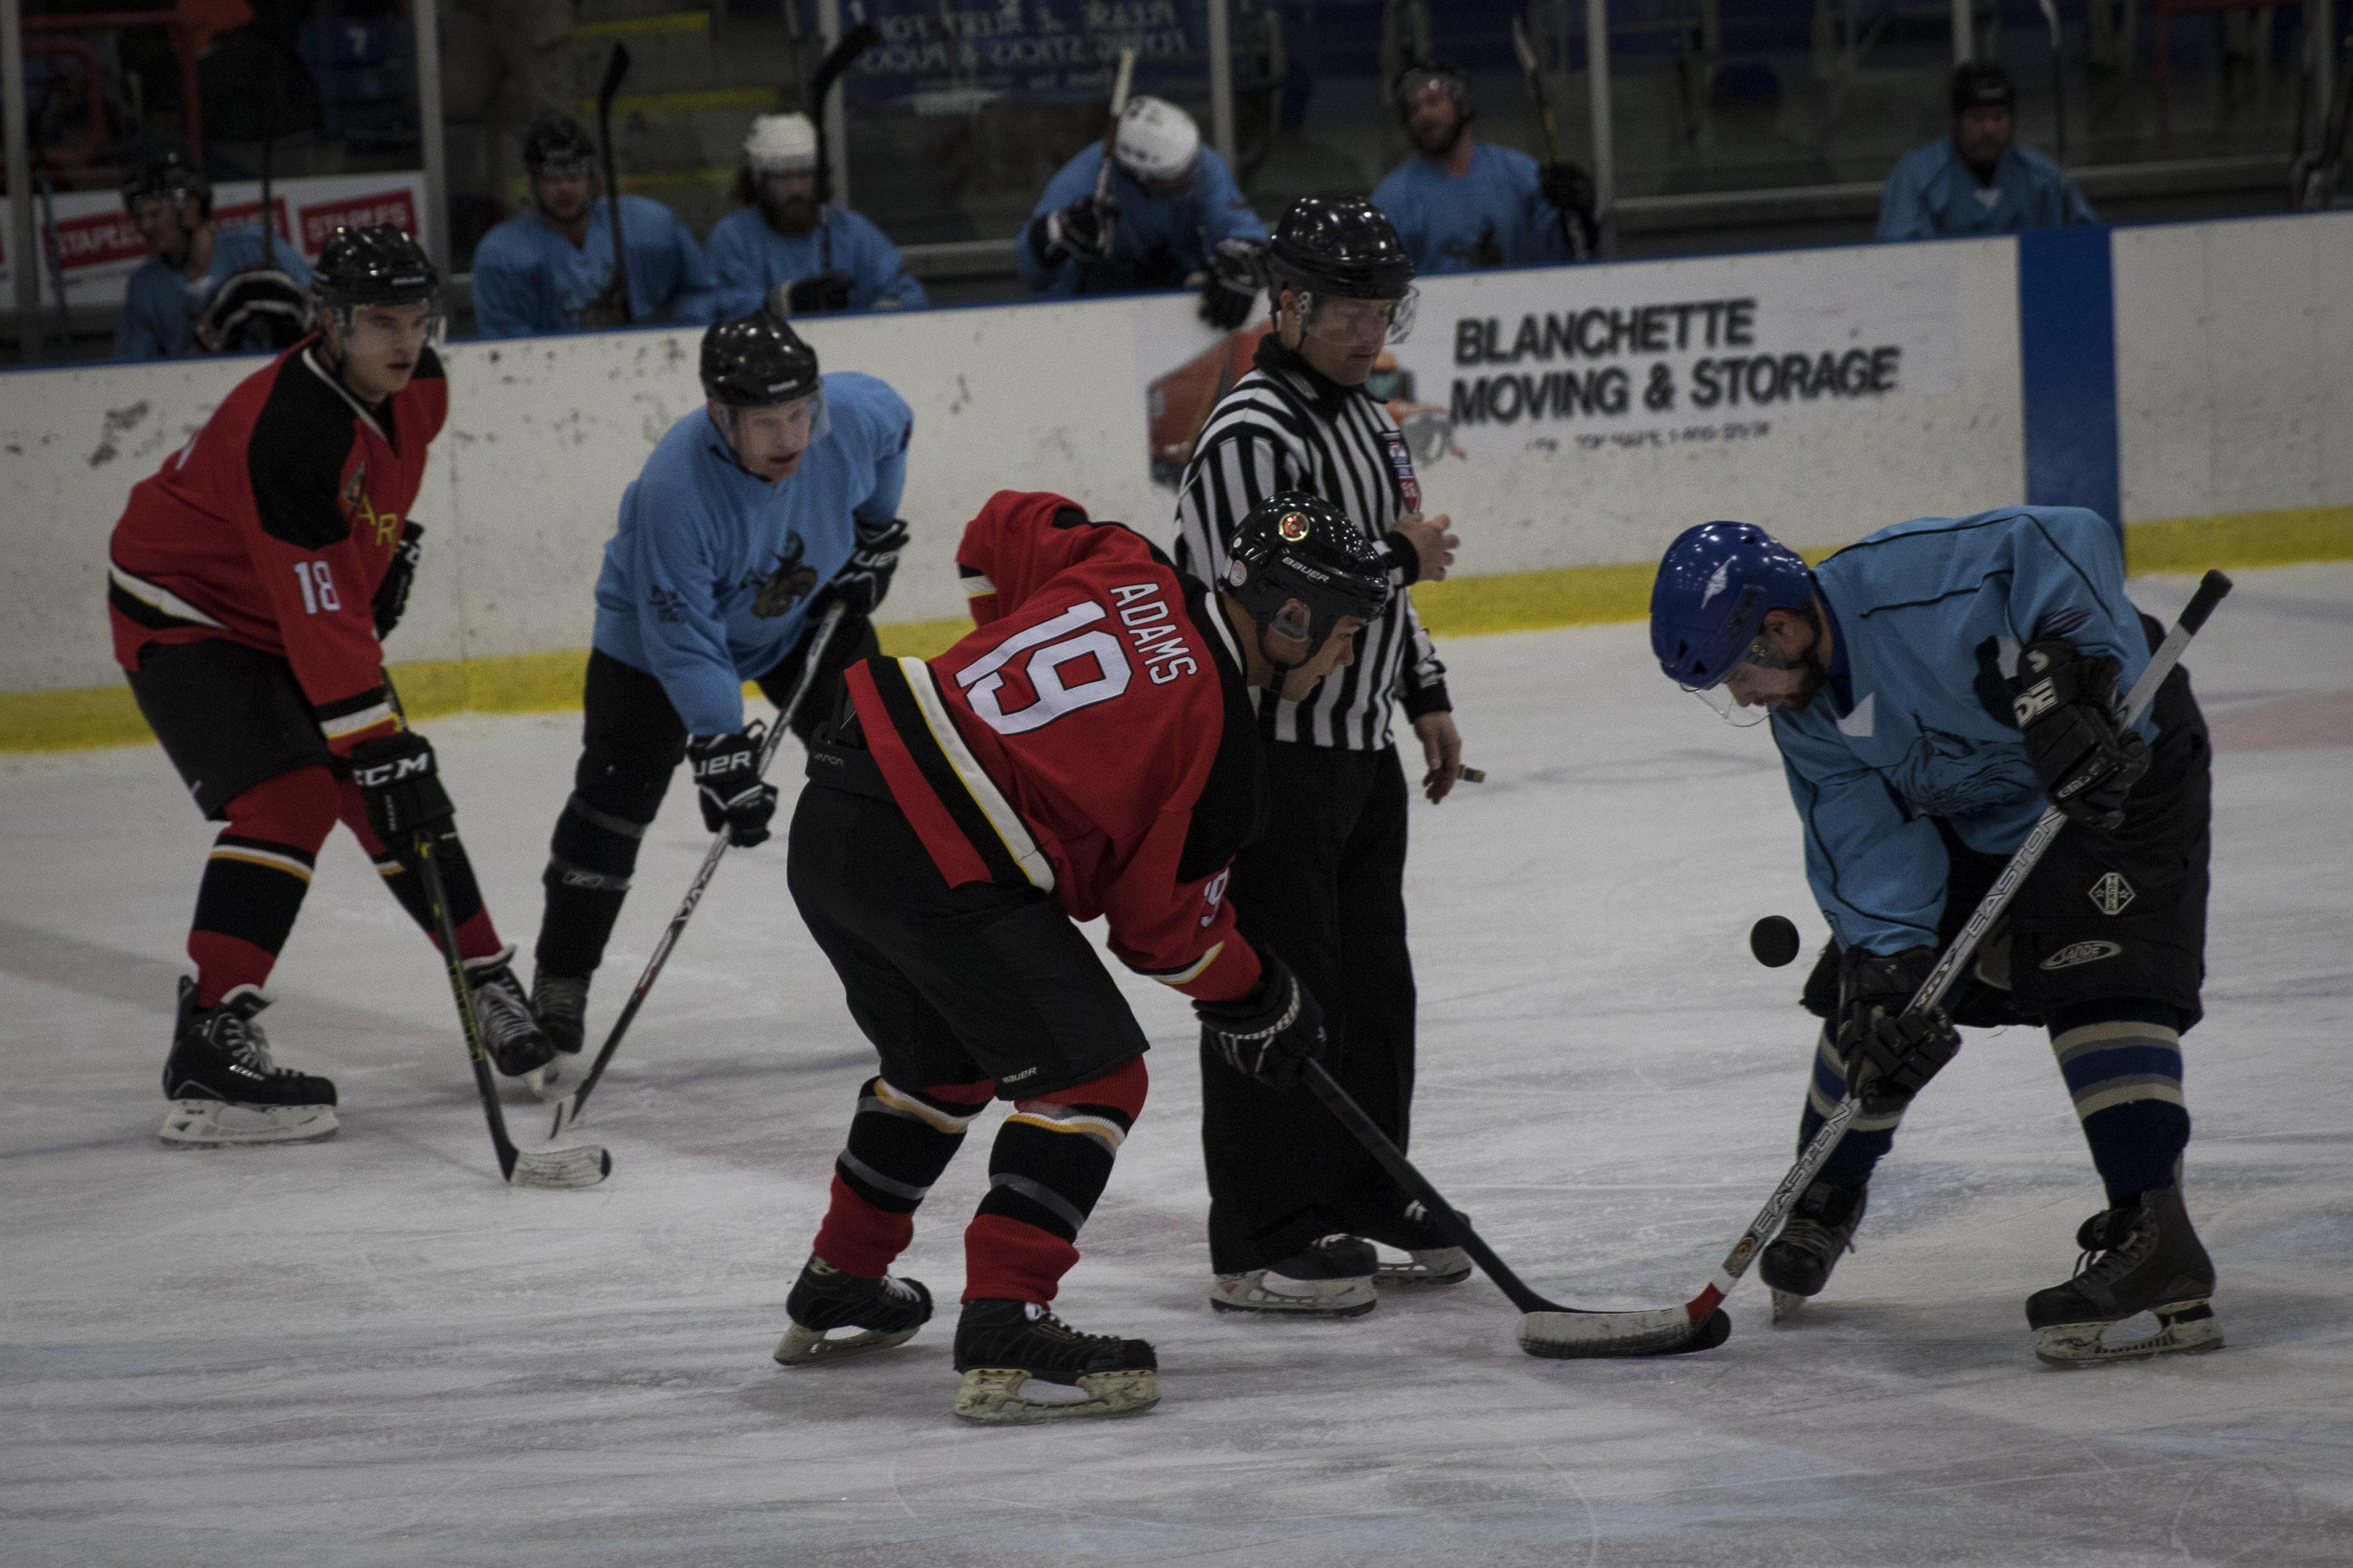 Marine Hockey Team Plays In Maine